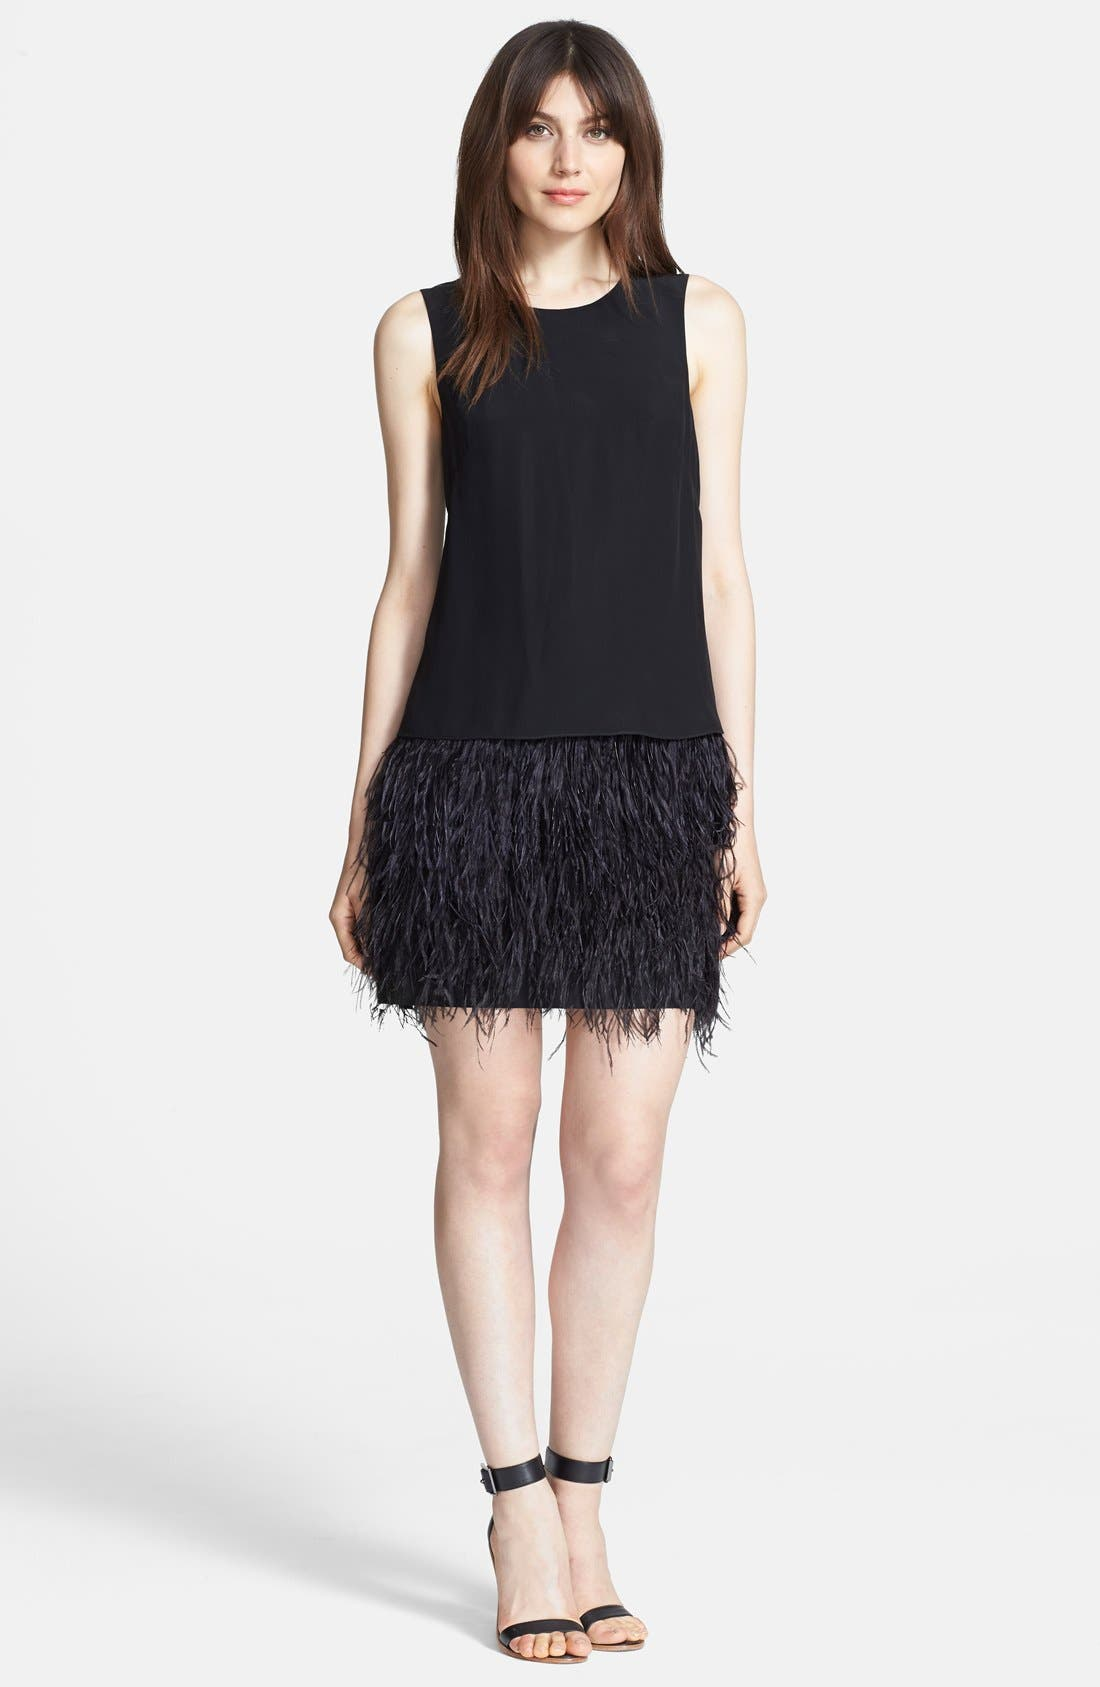 Alternate Image 1 Selected - Tibi 'Cera Tuxedo' Ostrich Feather Dress